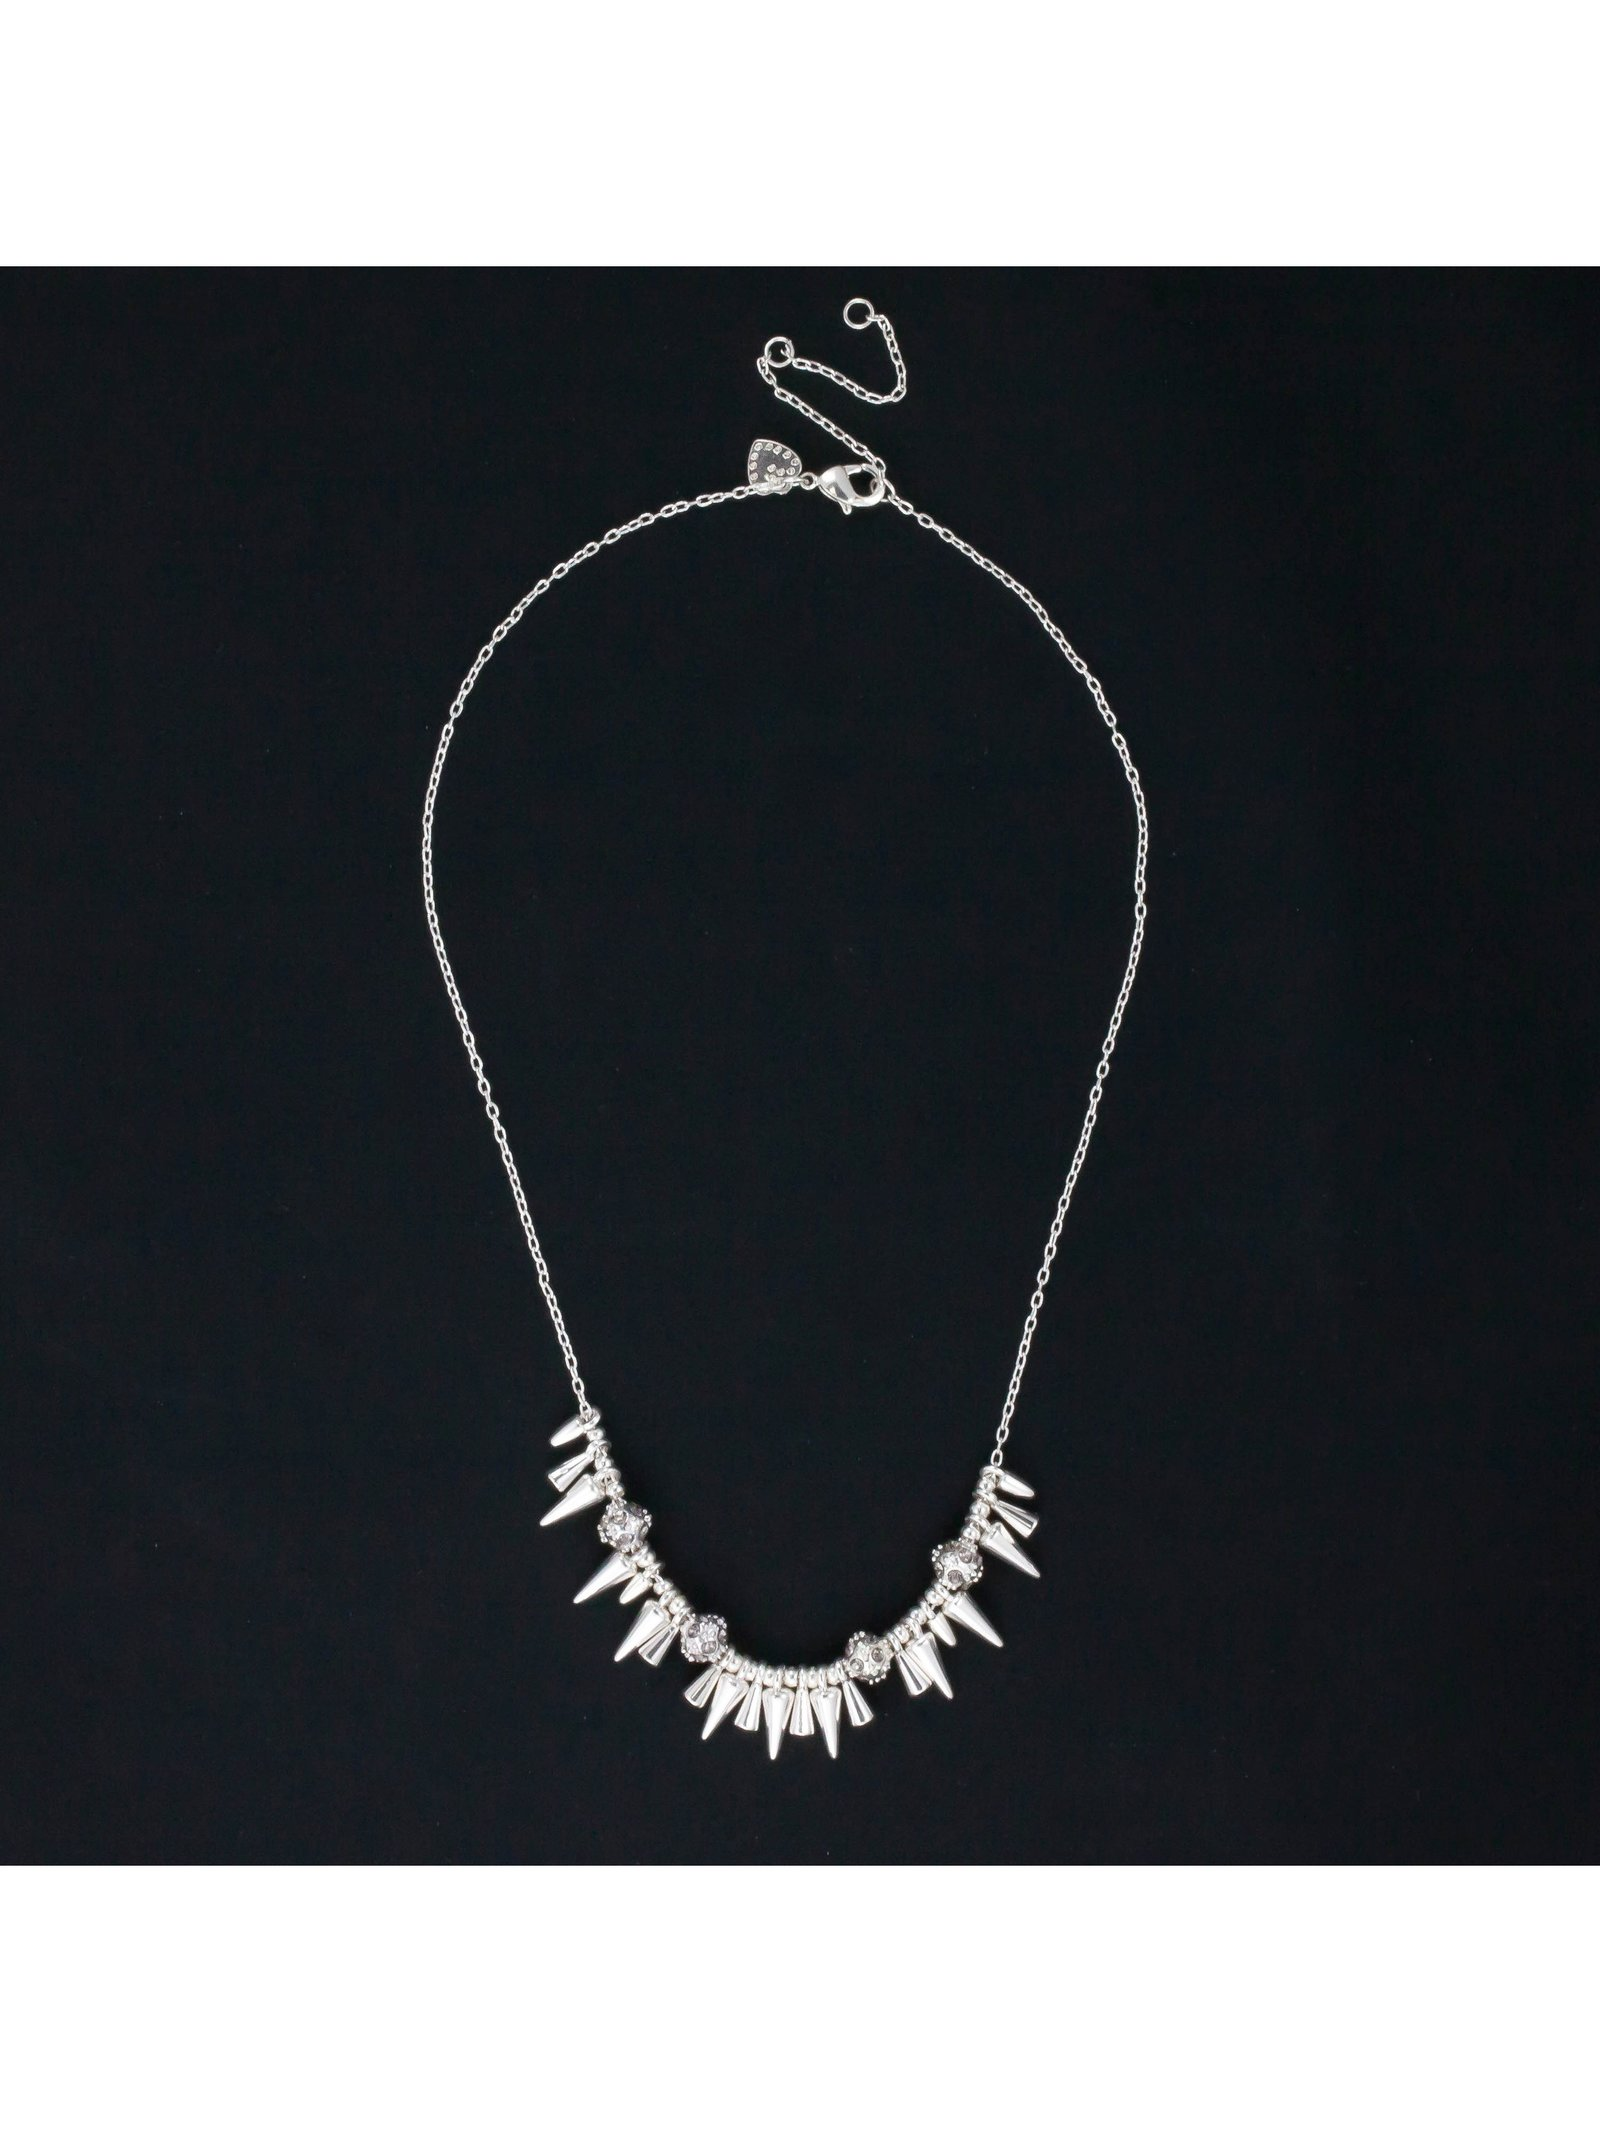 TotallyJewel Rivet Mini Spikey Necklace Silver